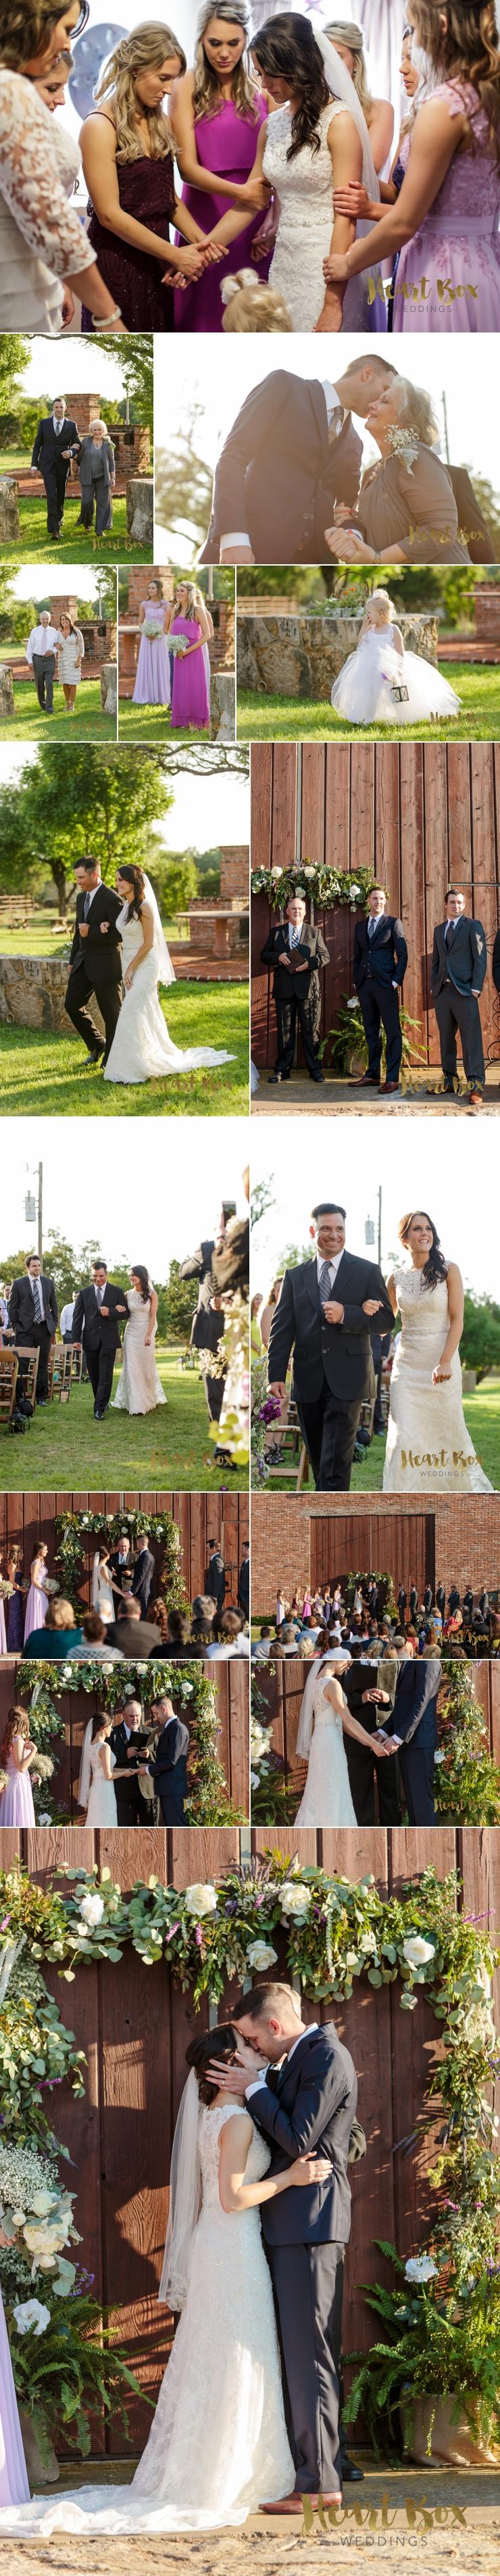 Thomas Wedding Blog Collages 5.jpg